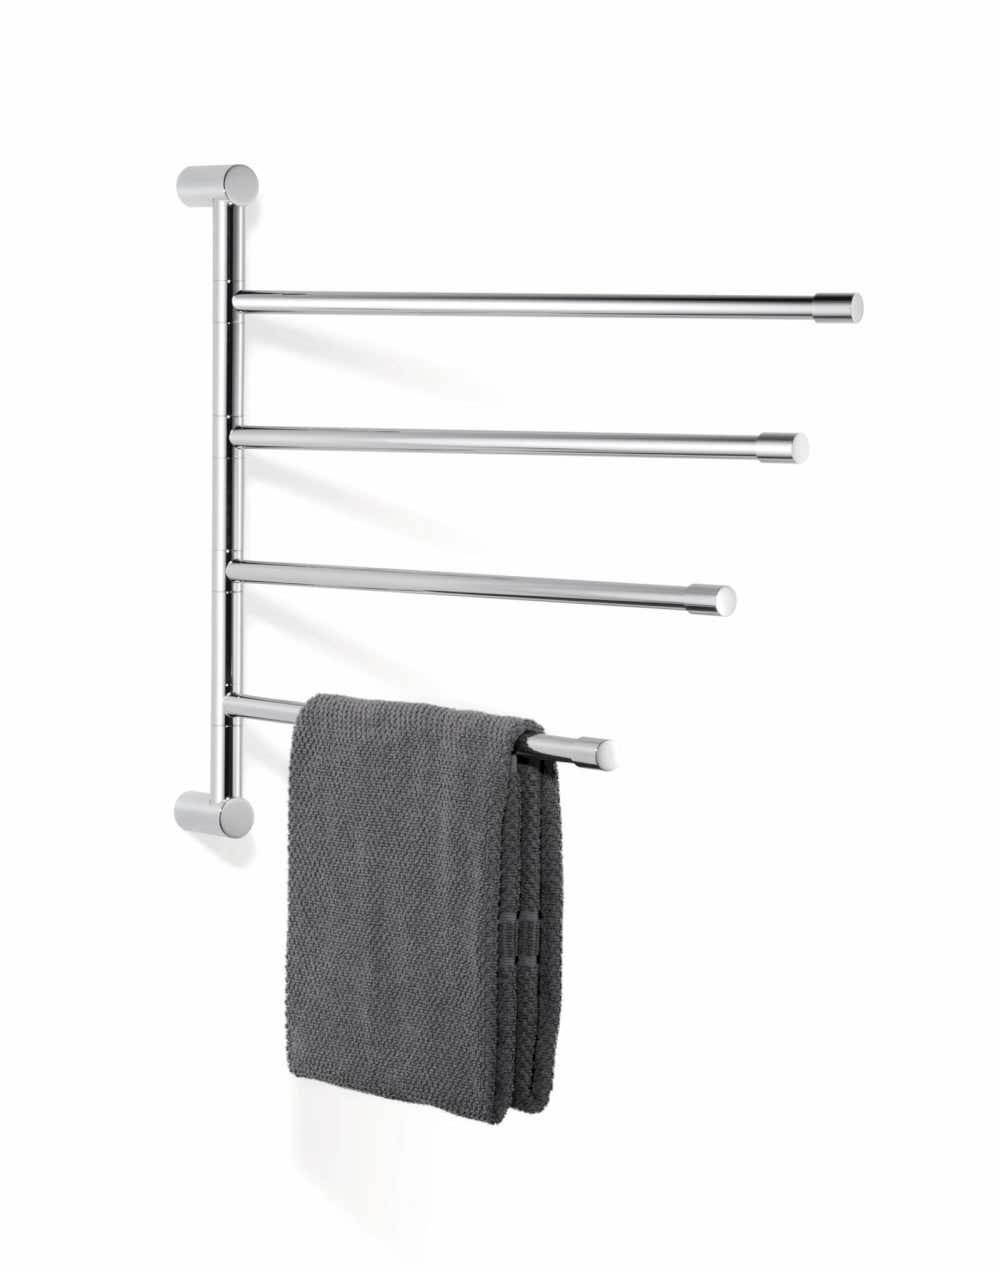 Accessoires Giese Sanitär Handtuchhalter Provider